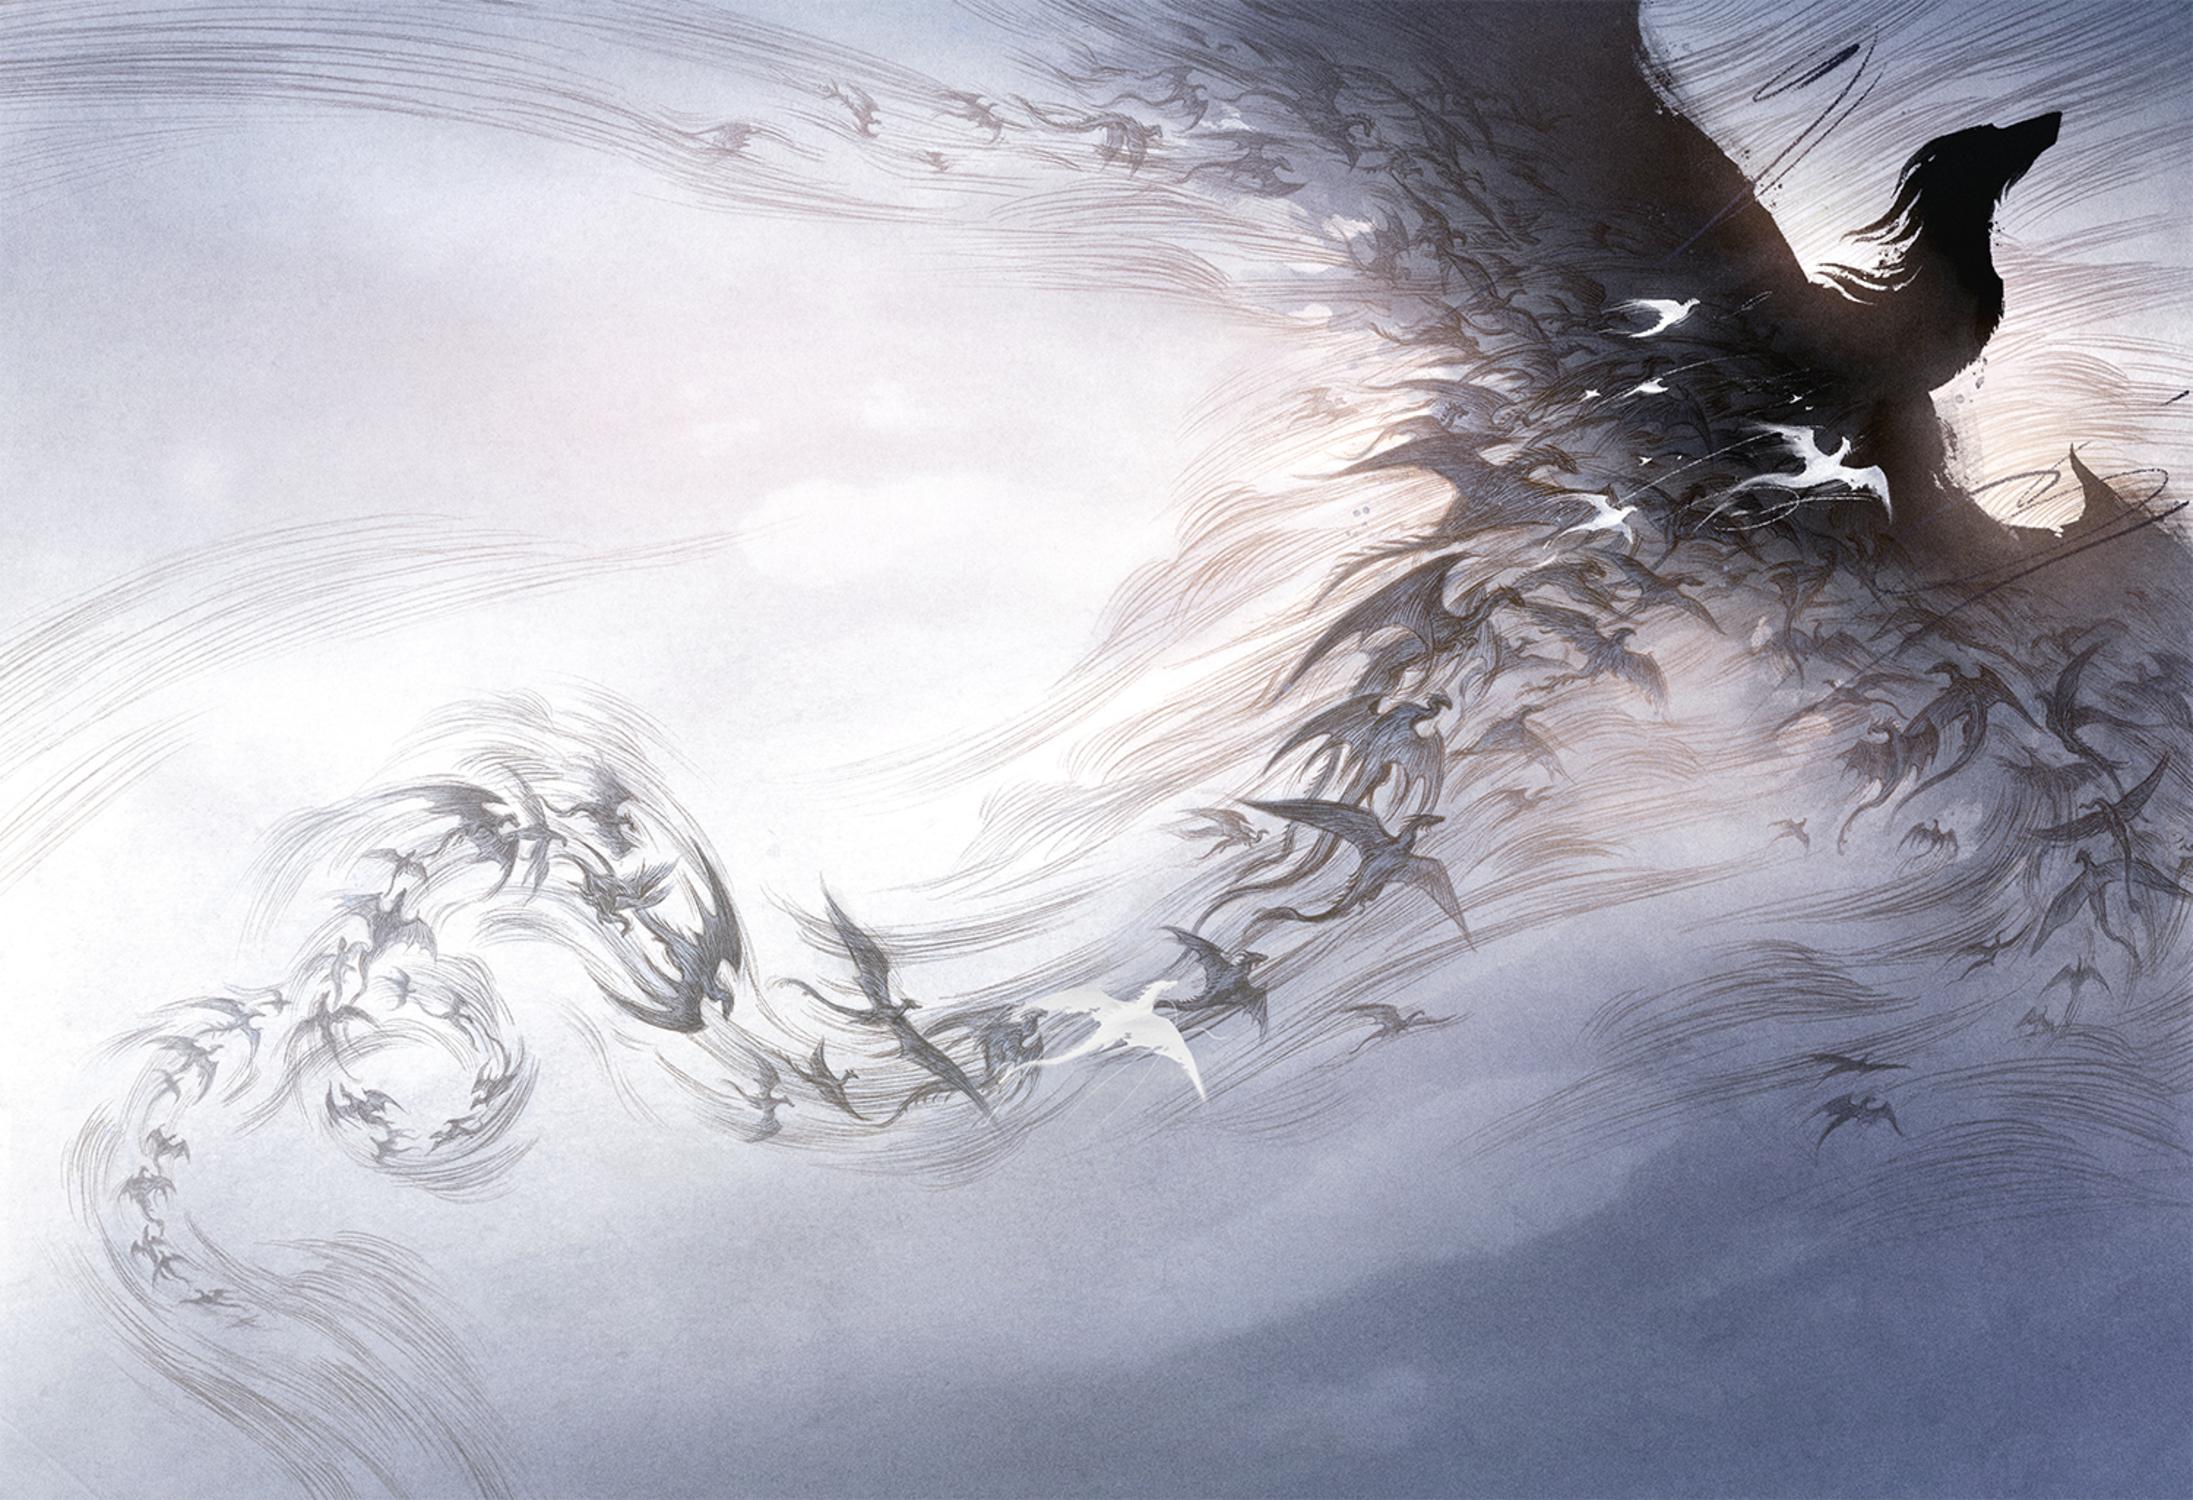 Dragon Swarm Artwork by Rovina Cai